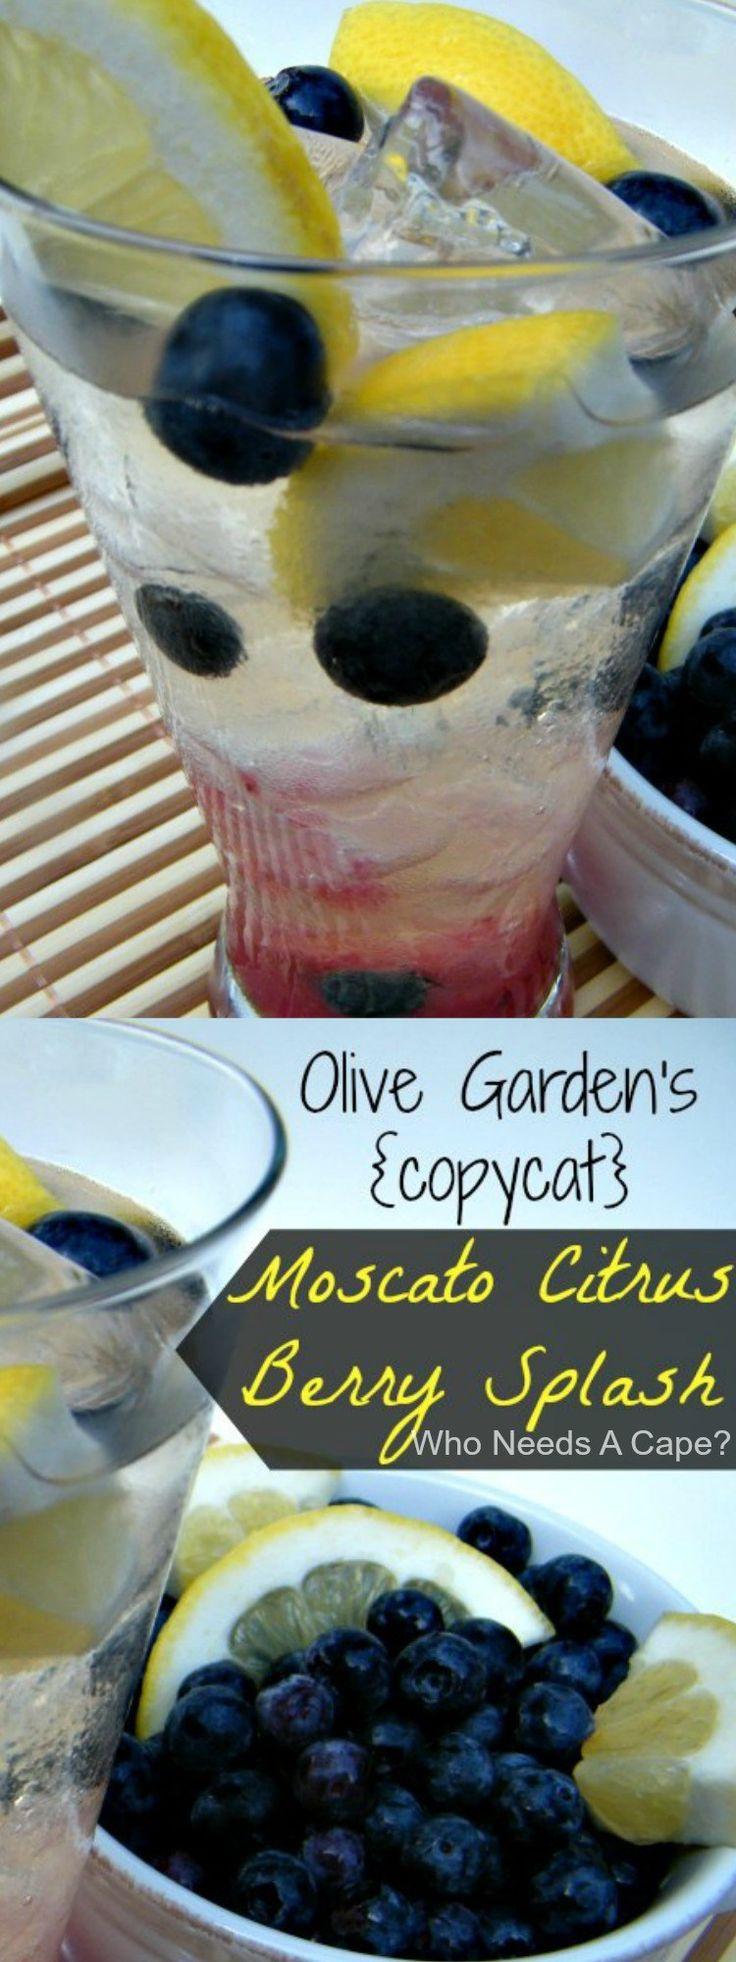 Olive Garden's {copycat} Moscato Citrus Berry Splash is a fantastic summertime cocktail, just like the restaurant version!